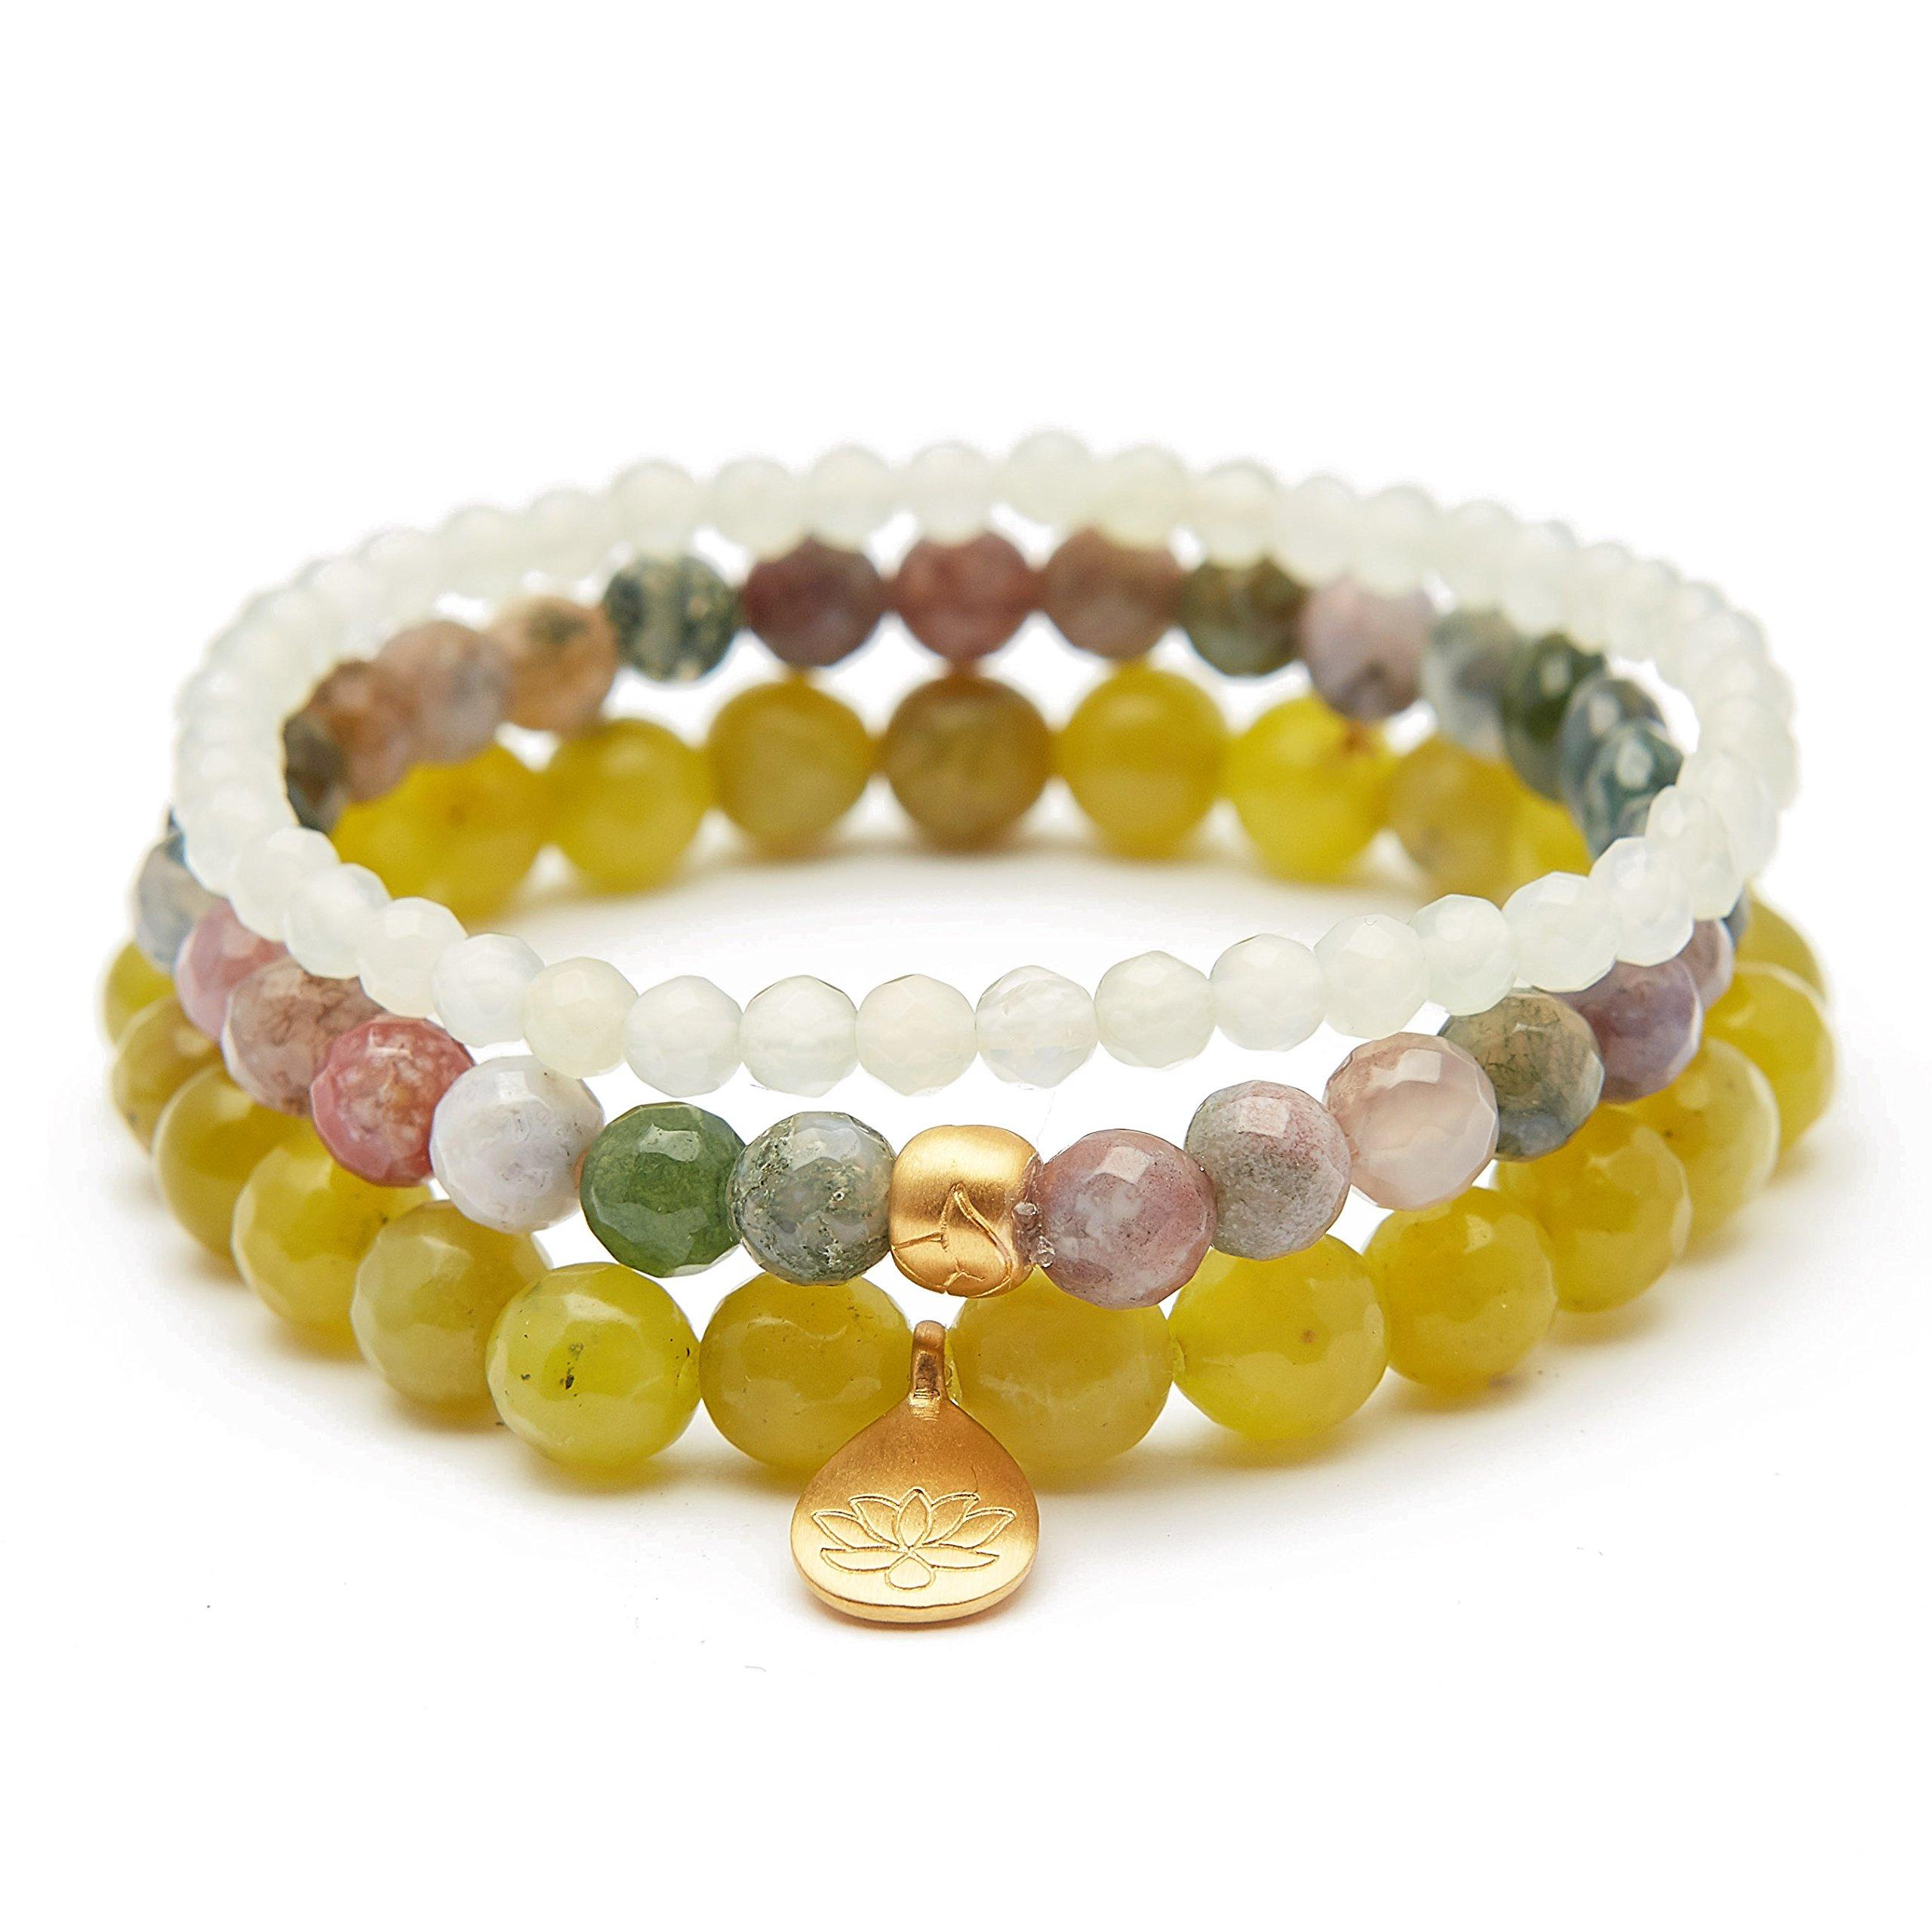 Satya Jewelry Women's Olive Jade Fancy Jasper New Jade Gold Lotus Stretch Bracelet Set, Green, One Size